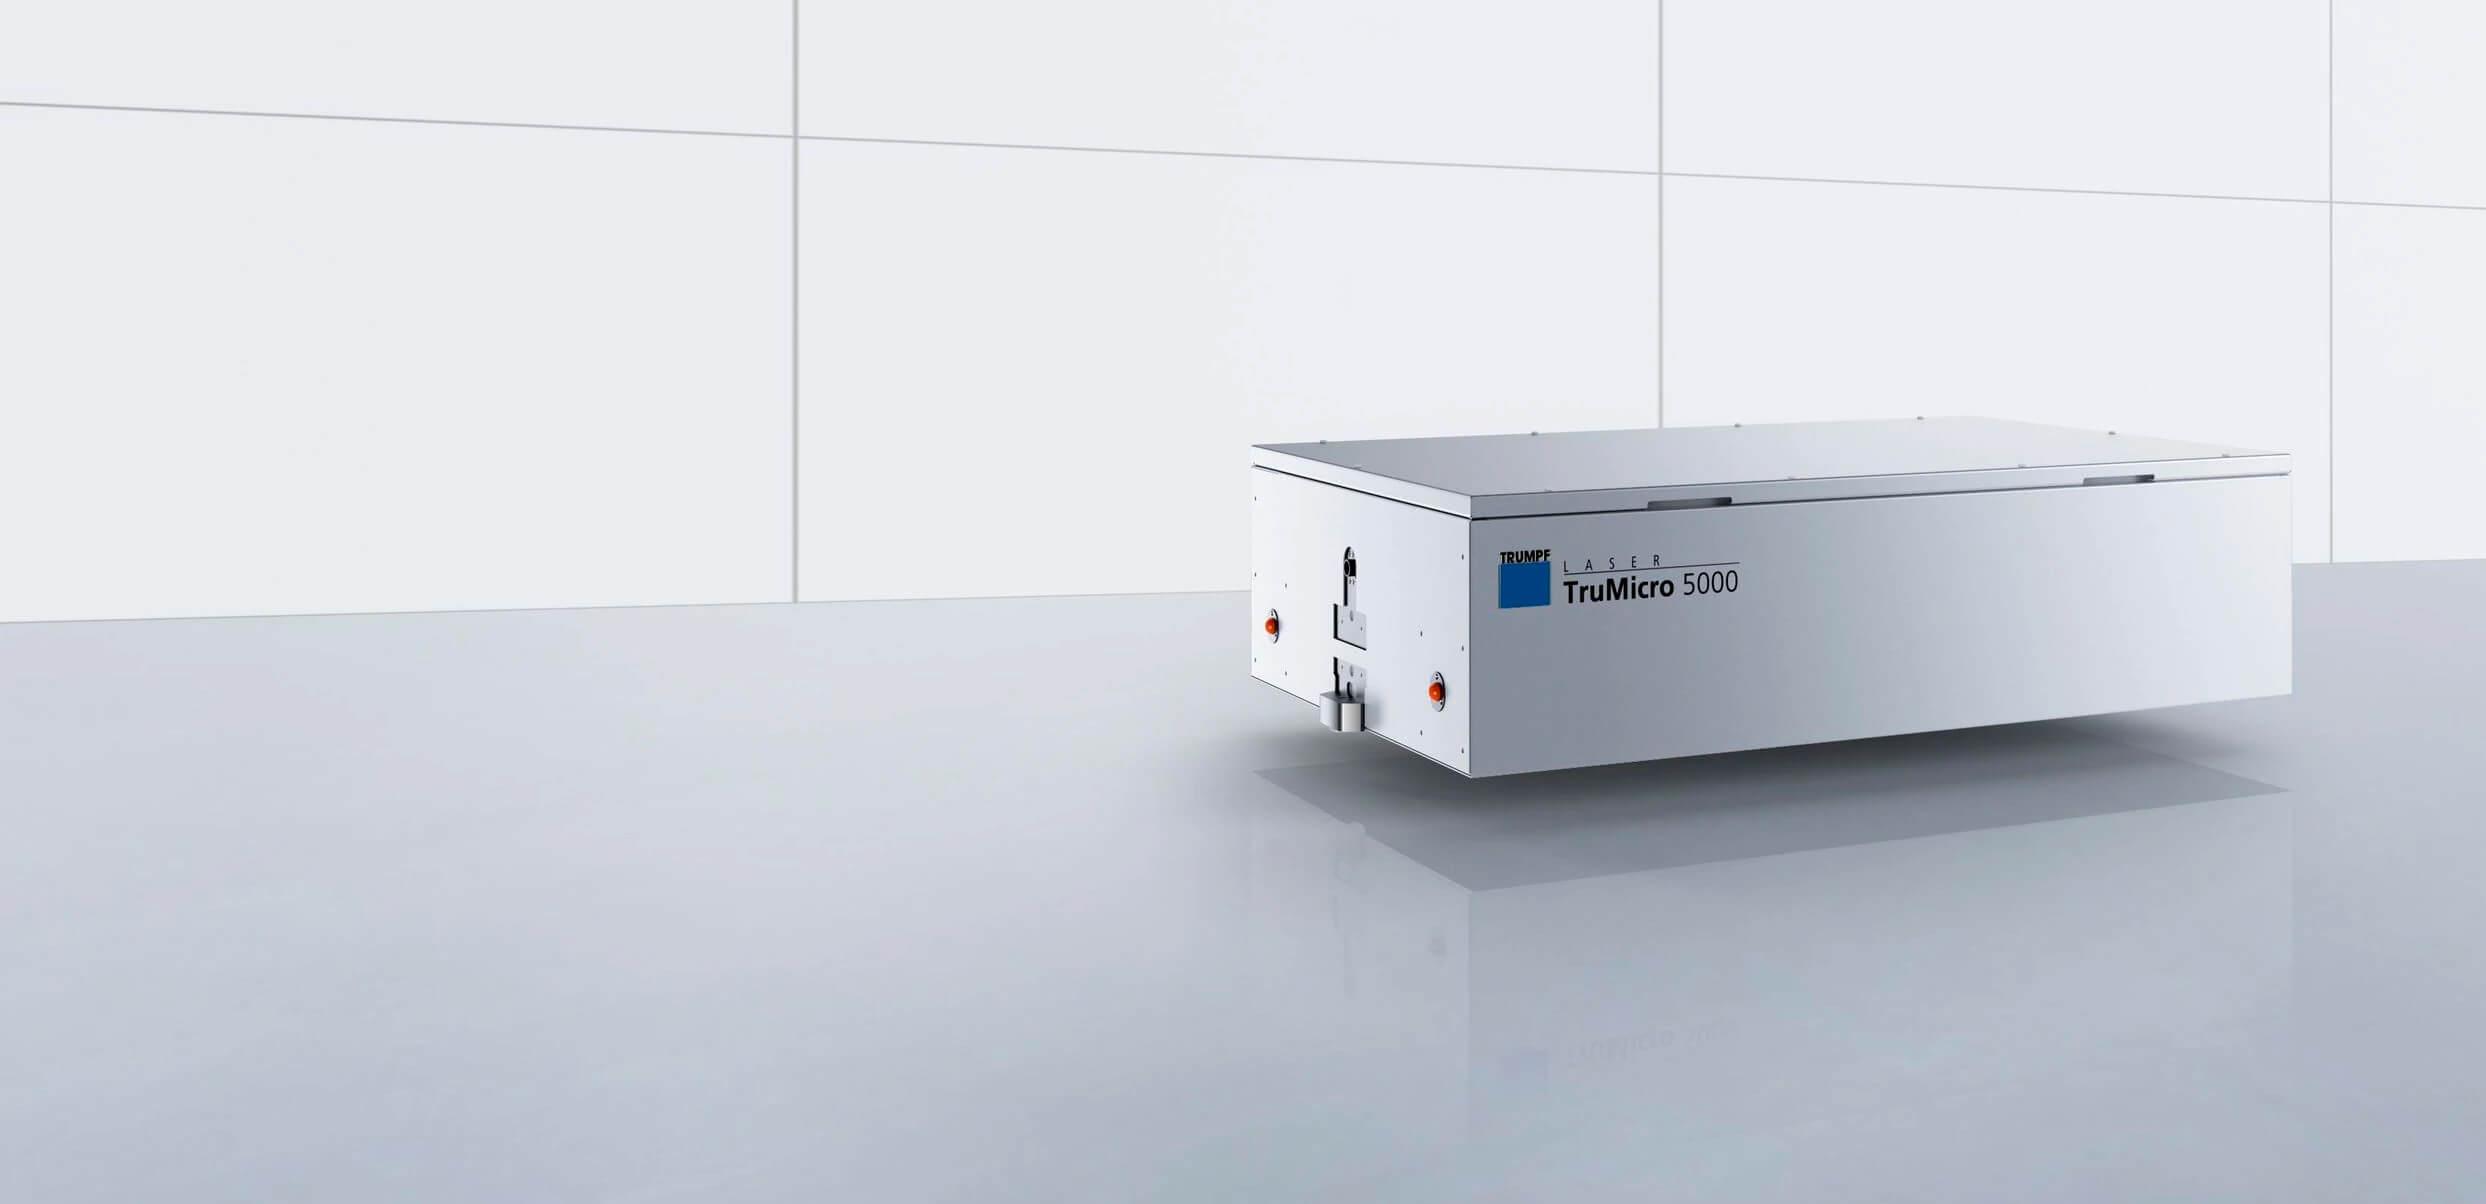 TruMicro 5000